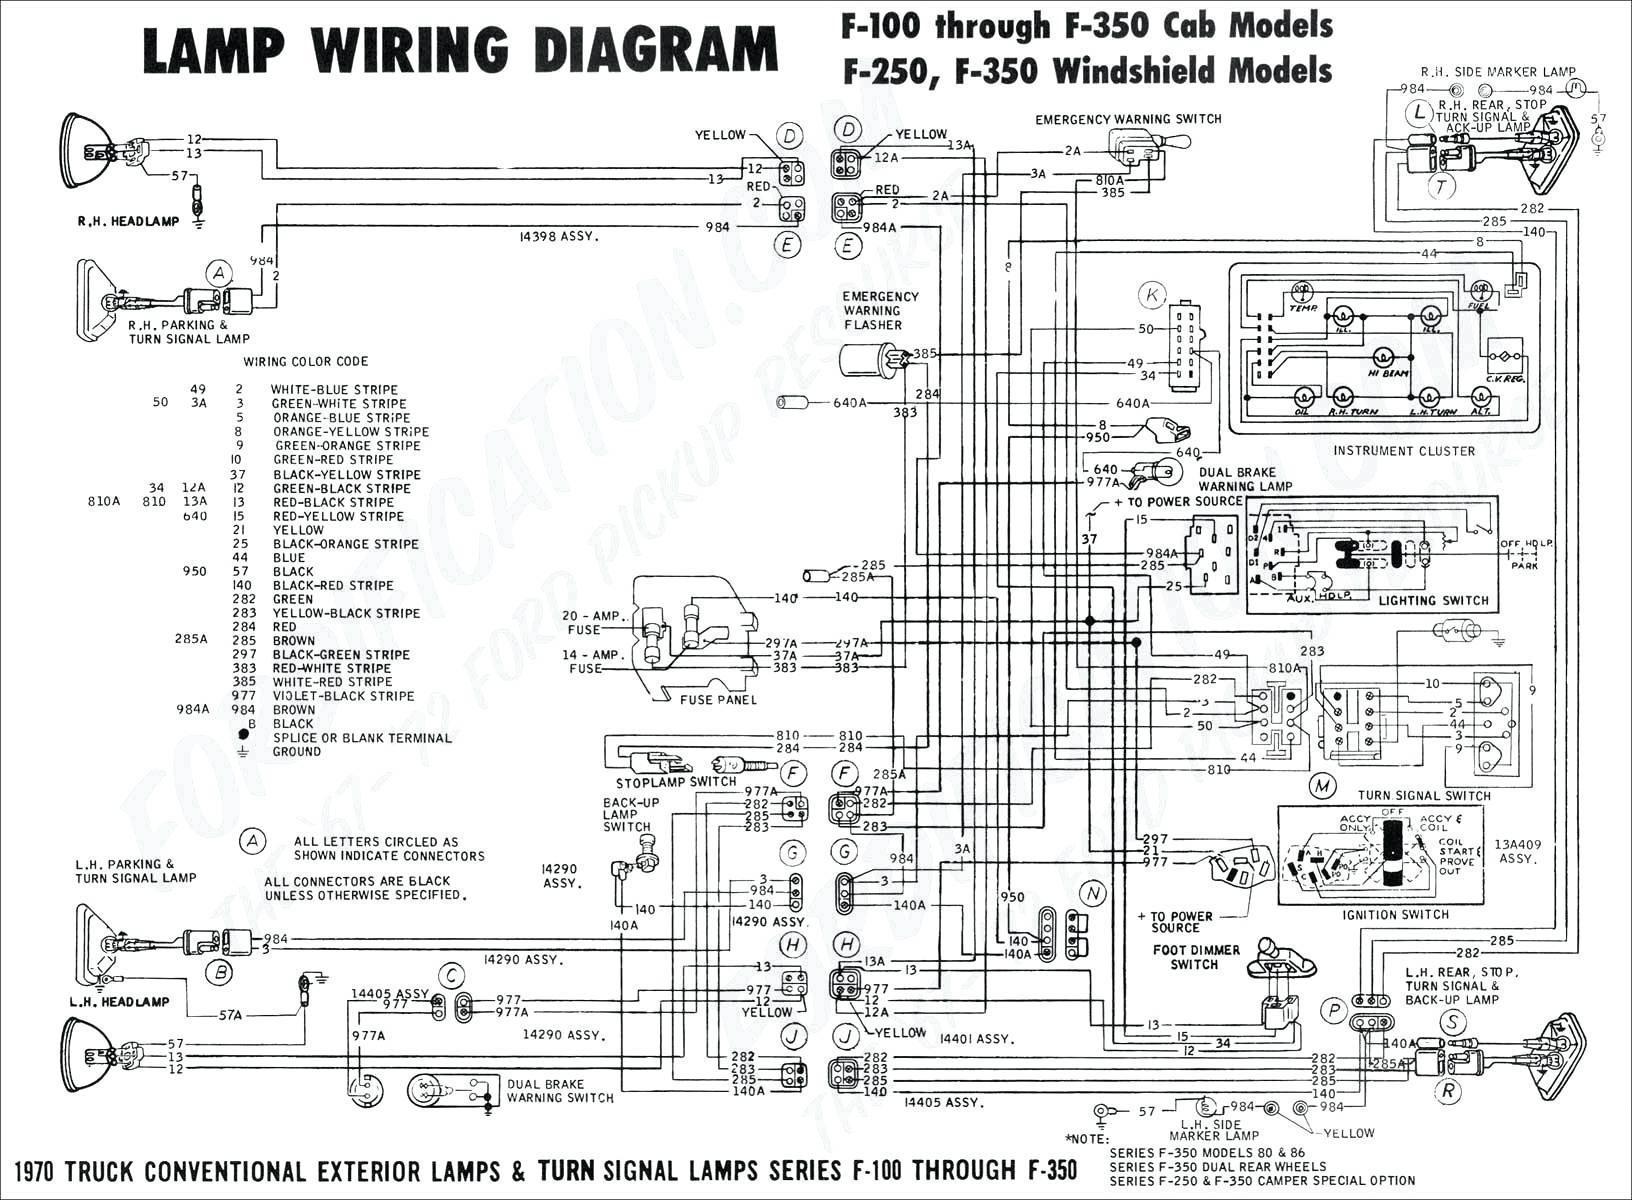 1996 toyota Tercel Engine Diagram 96 Monte Carlo Wiring Diagram Worksheet and Wiring Diagram • Of 1996 toyota Tercel Engine Diagram